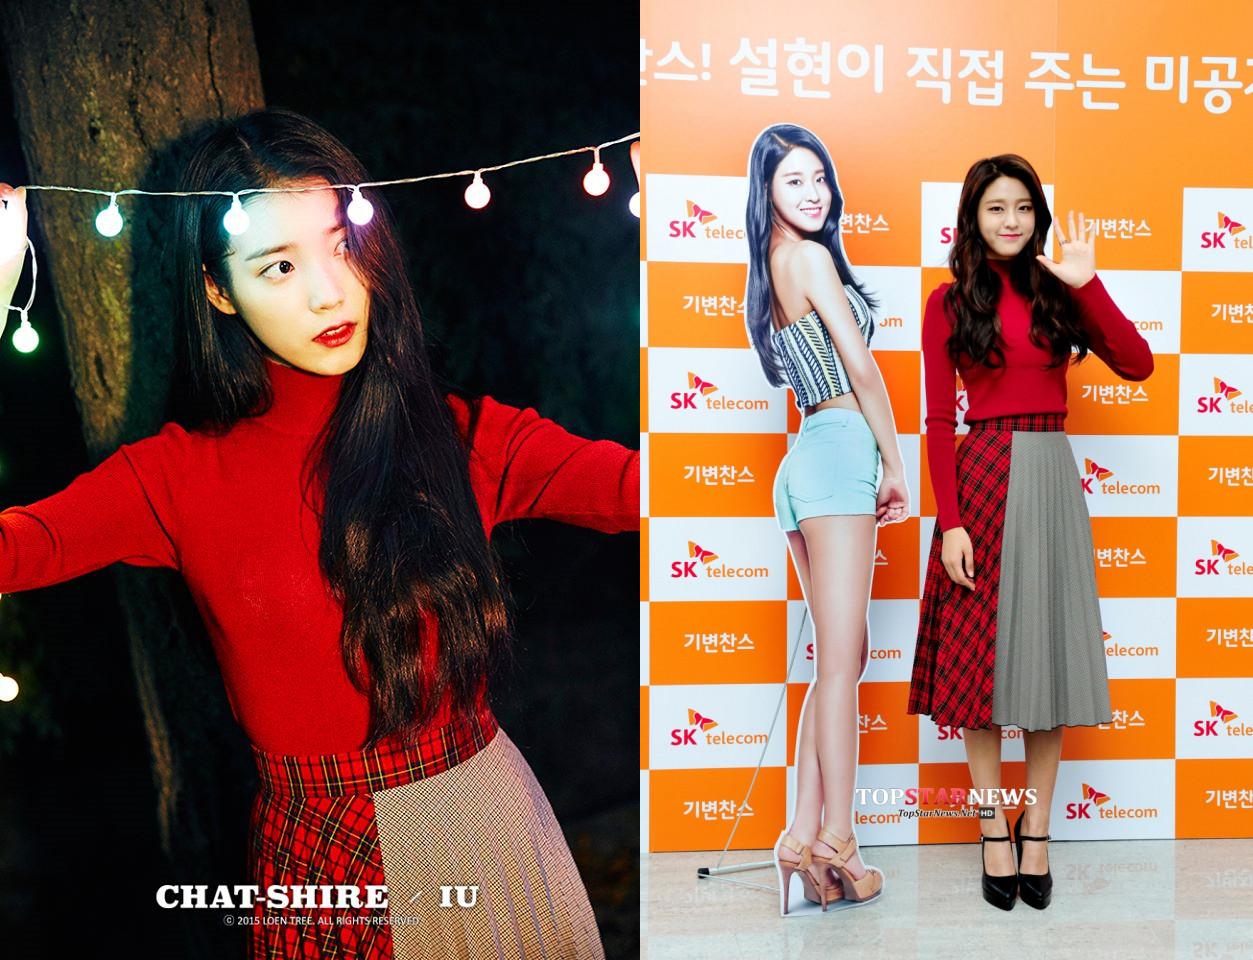 #IU & AOA 雪炫 這件英倫風洋裝不論是誰穿,都能穿出一股女神氣